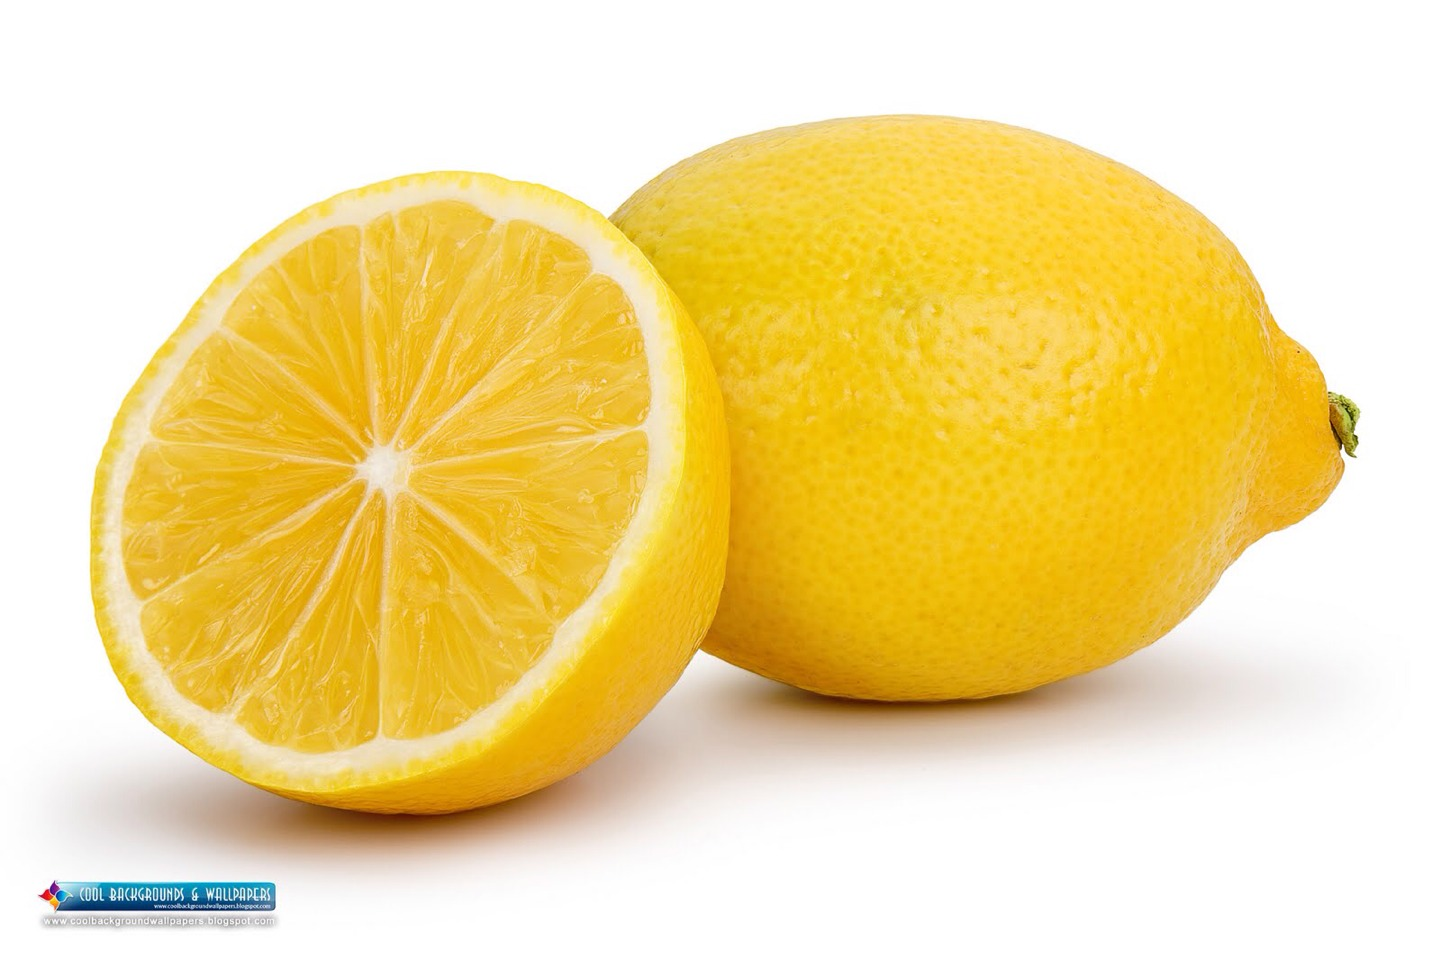 Add 2 tablespoons of lemon juice